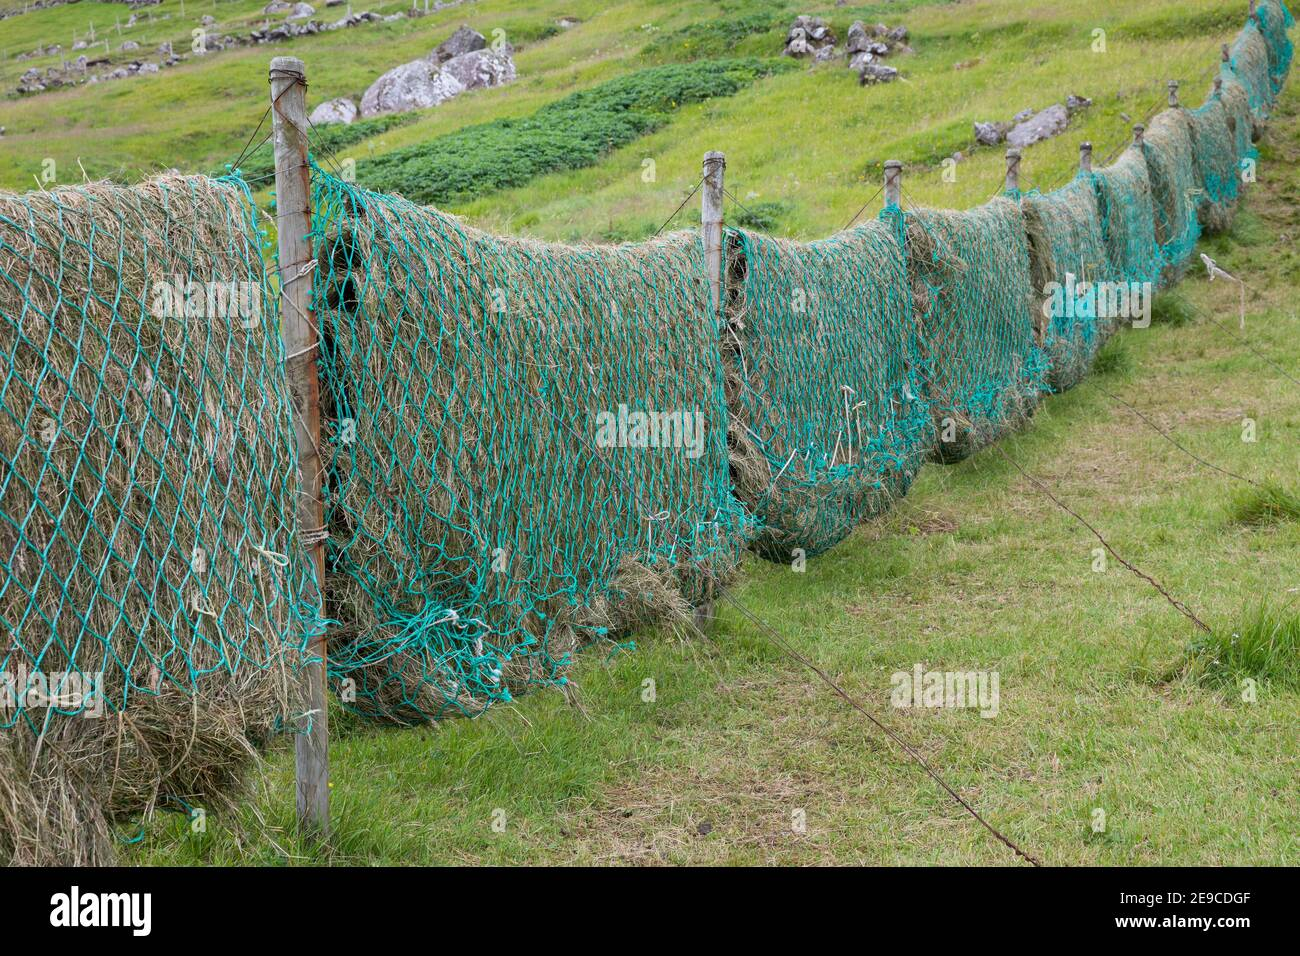 Heu trocknen in alten Fischernetzen, Heu machen, Heu, Färöer, Färöer-Inseln, Färöer Inseln, hay, to make hay, to hay, Faroe, Faeroe Islands, Les Îles Stock Photo